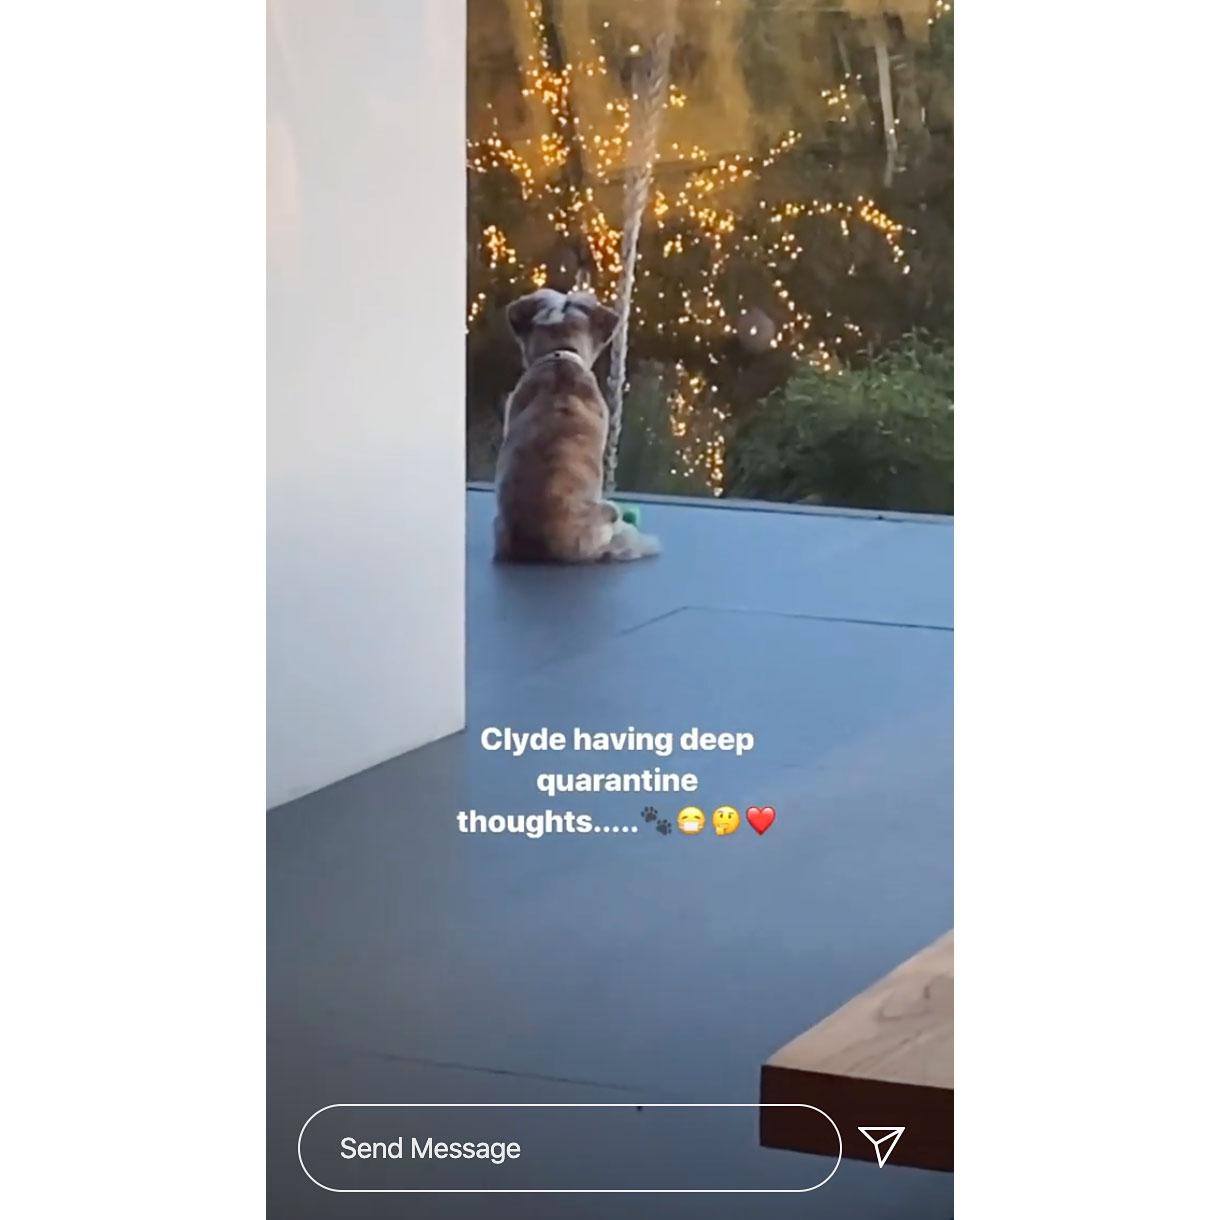 Jennifer Aniston Shows Her Pup Having Deep Quarantine Thoughts Amid Coronavirus Crisis